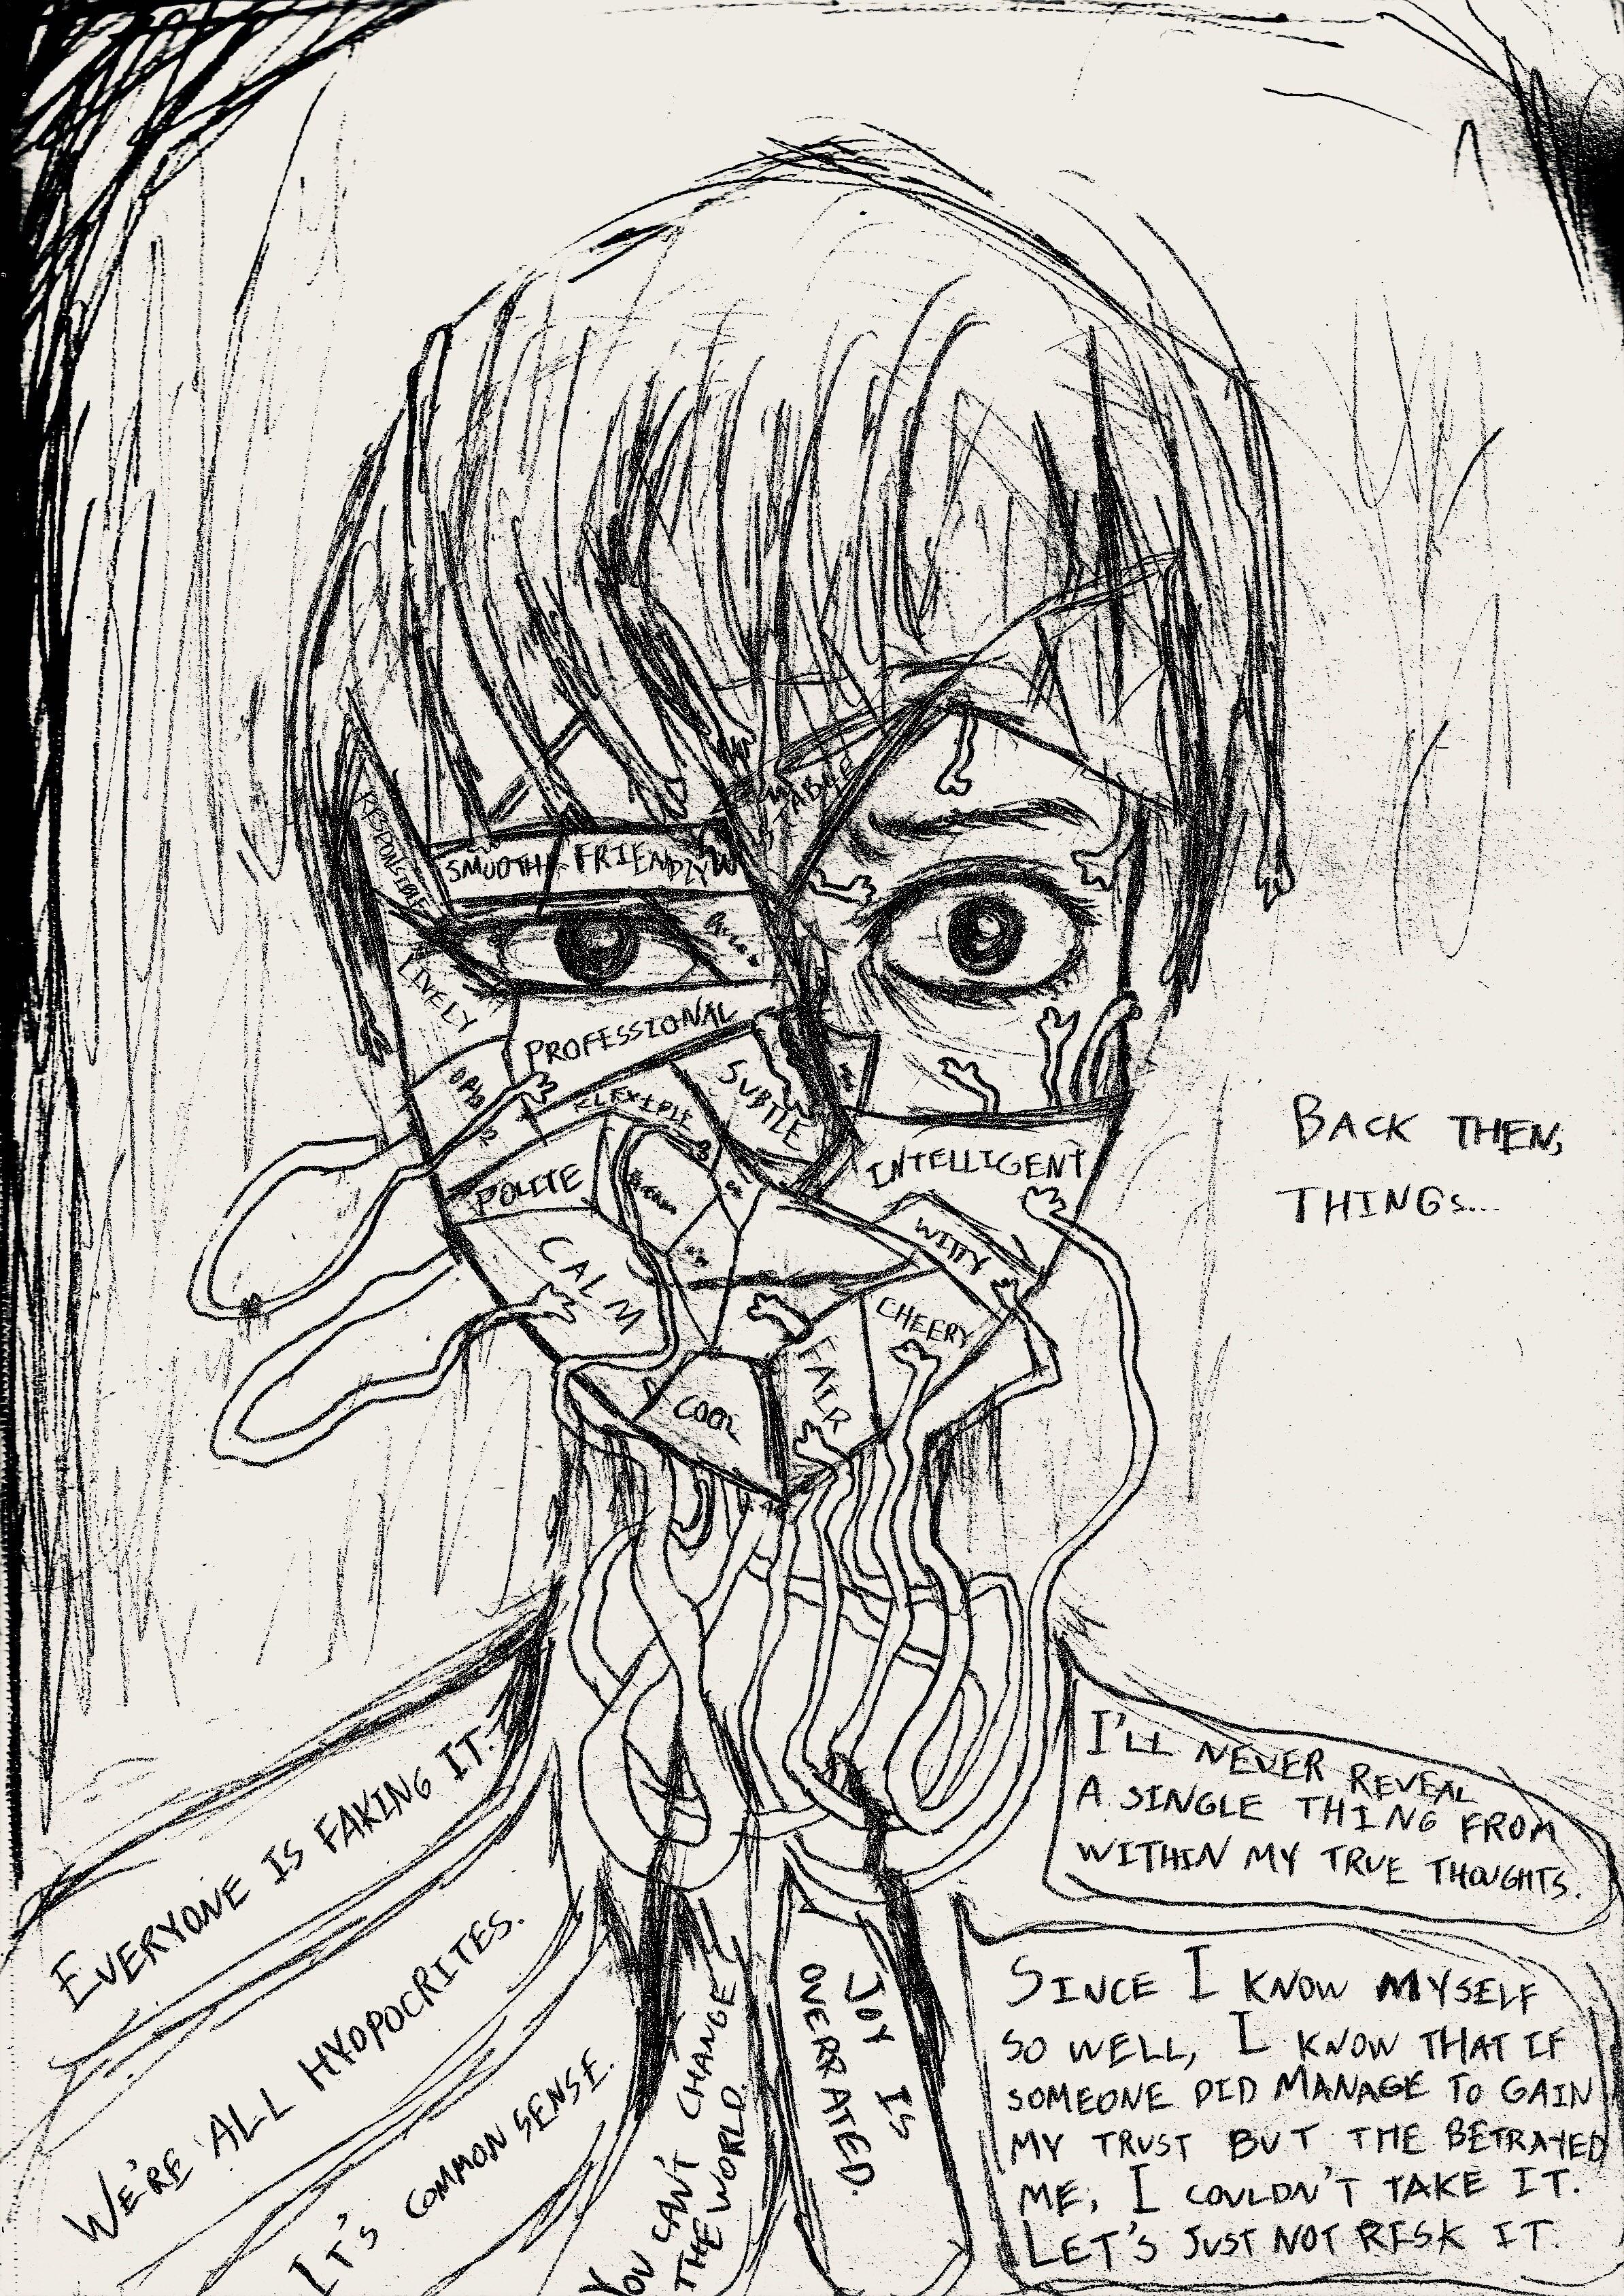 9. Masquerade